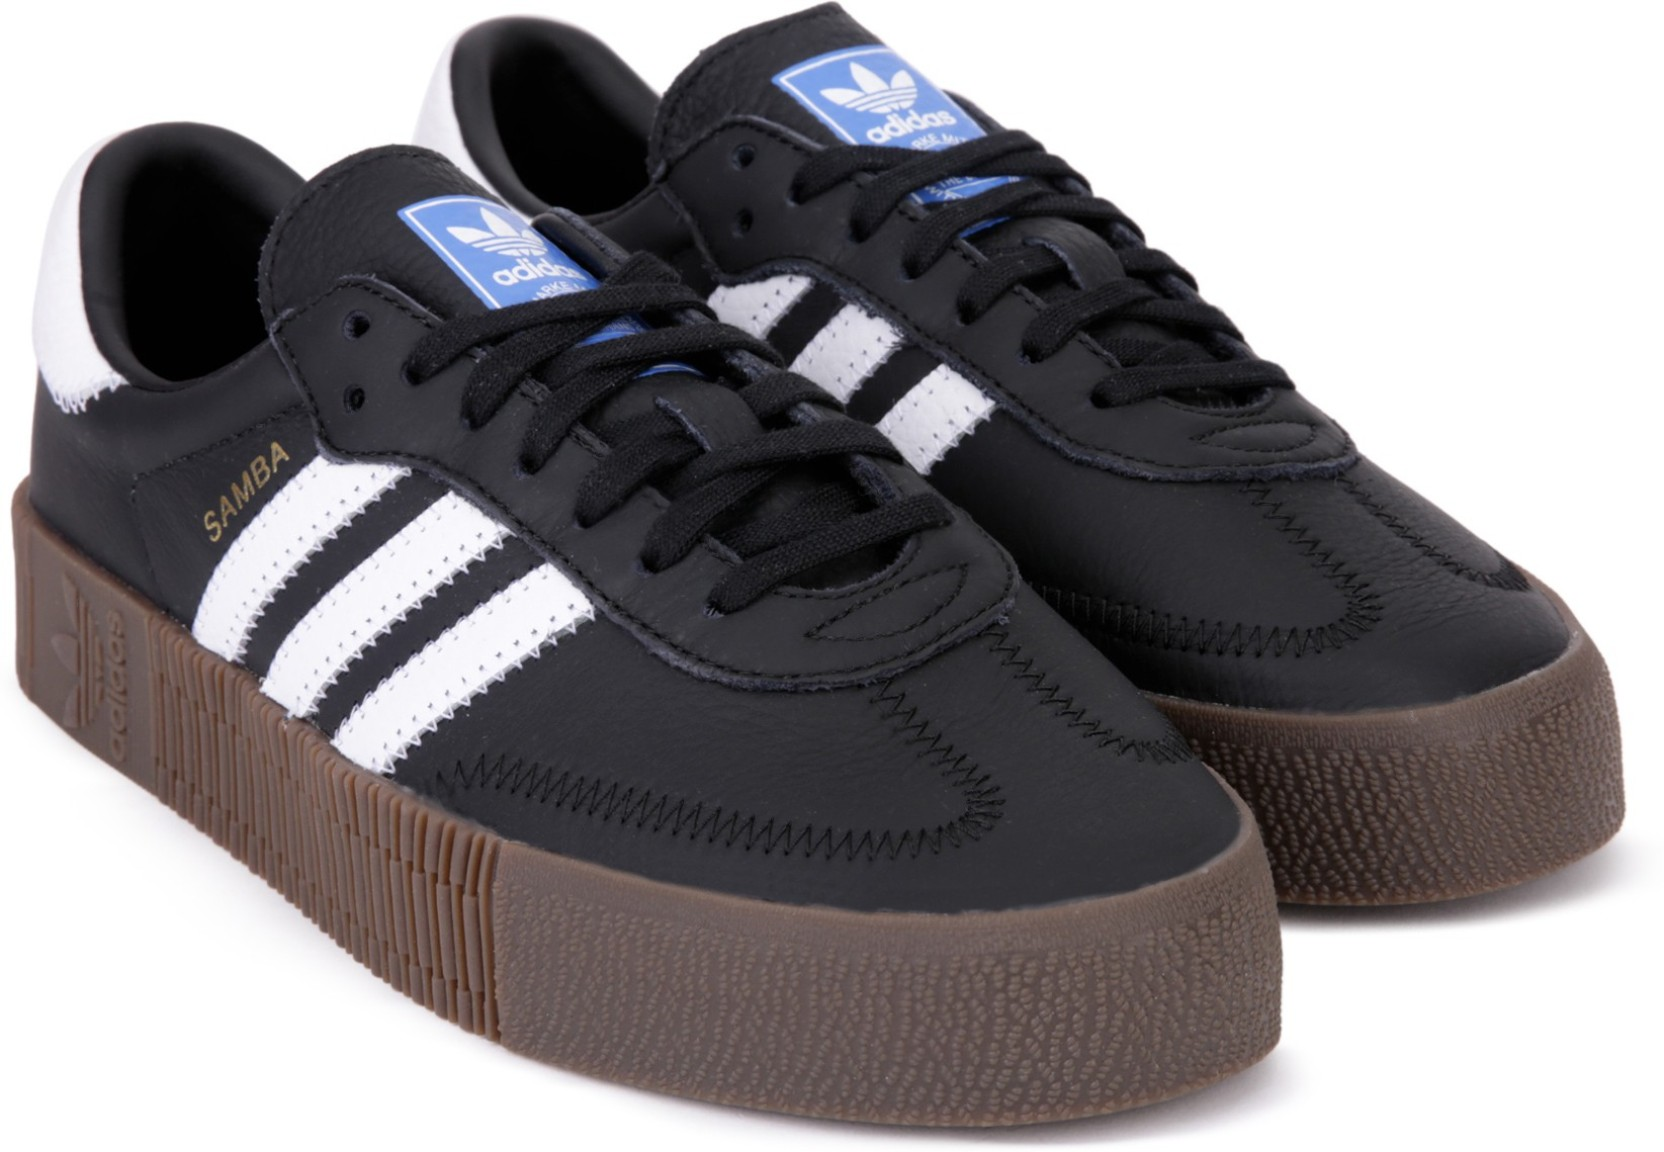 7d7dfc333f58 ADIDAS ORIGINALS SAMBAROSE W Running Shoes For Women - Buy CBLACK ...